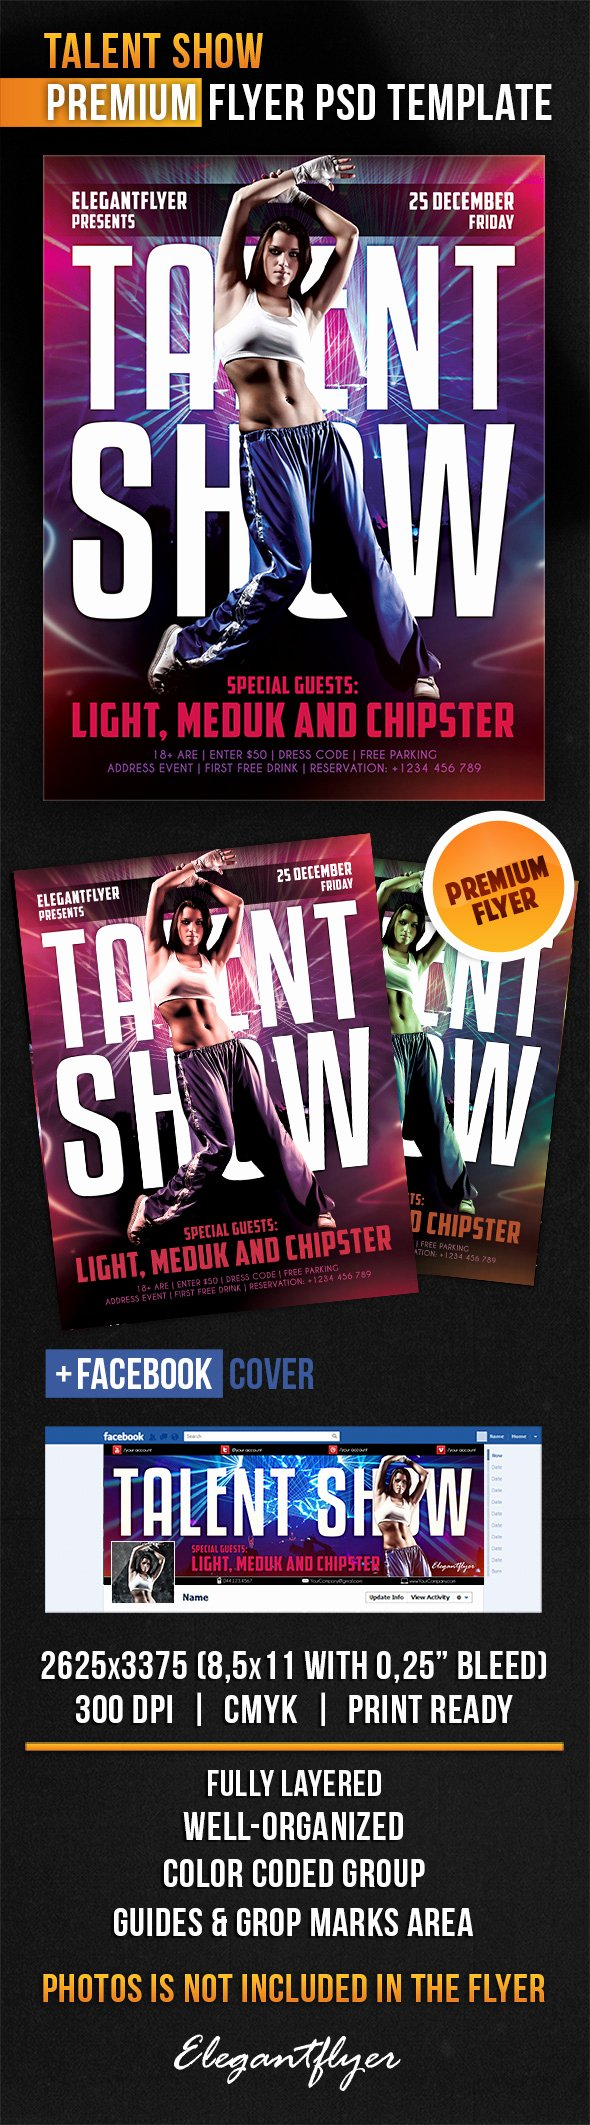 Talent Show Flyer Template Beautiful Talent Show – Flyer Psd Template – by Elegantflyer